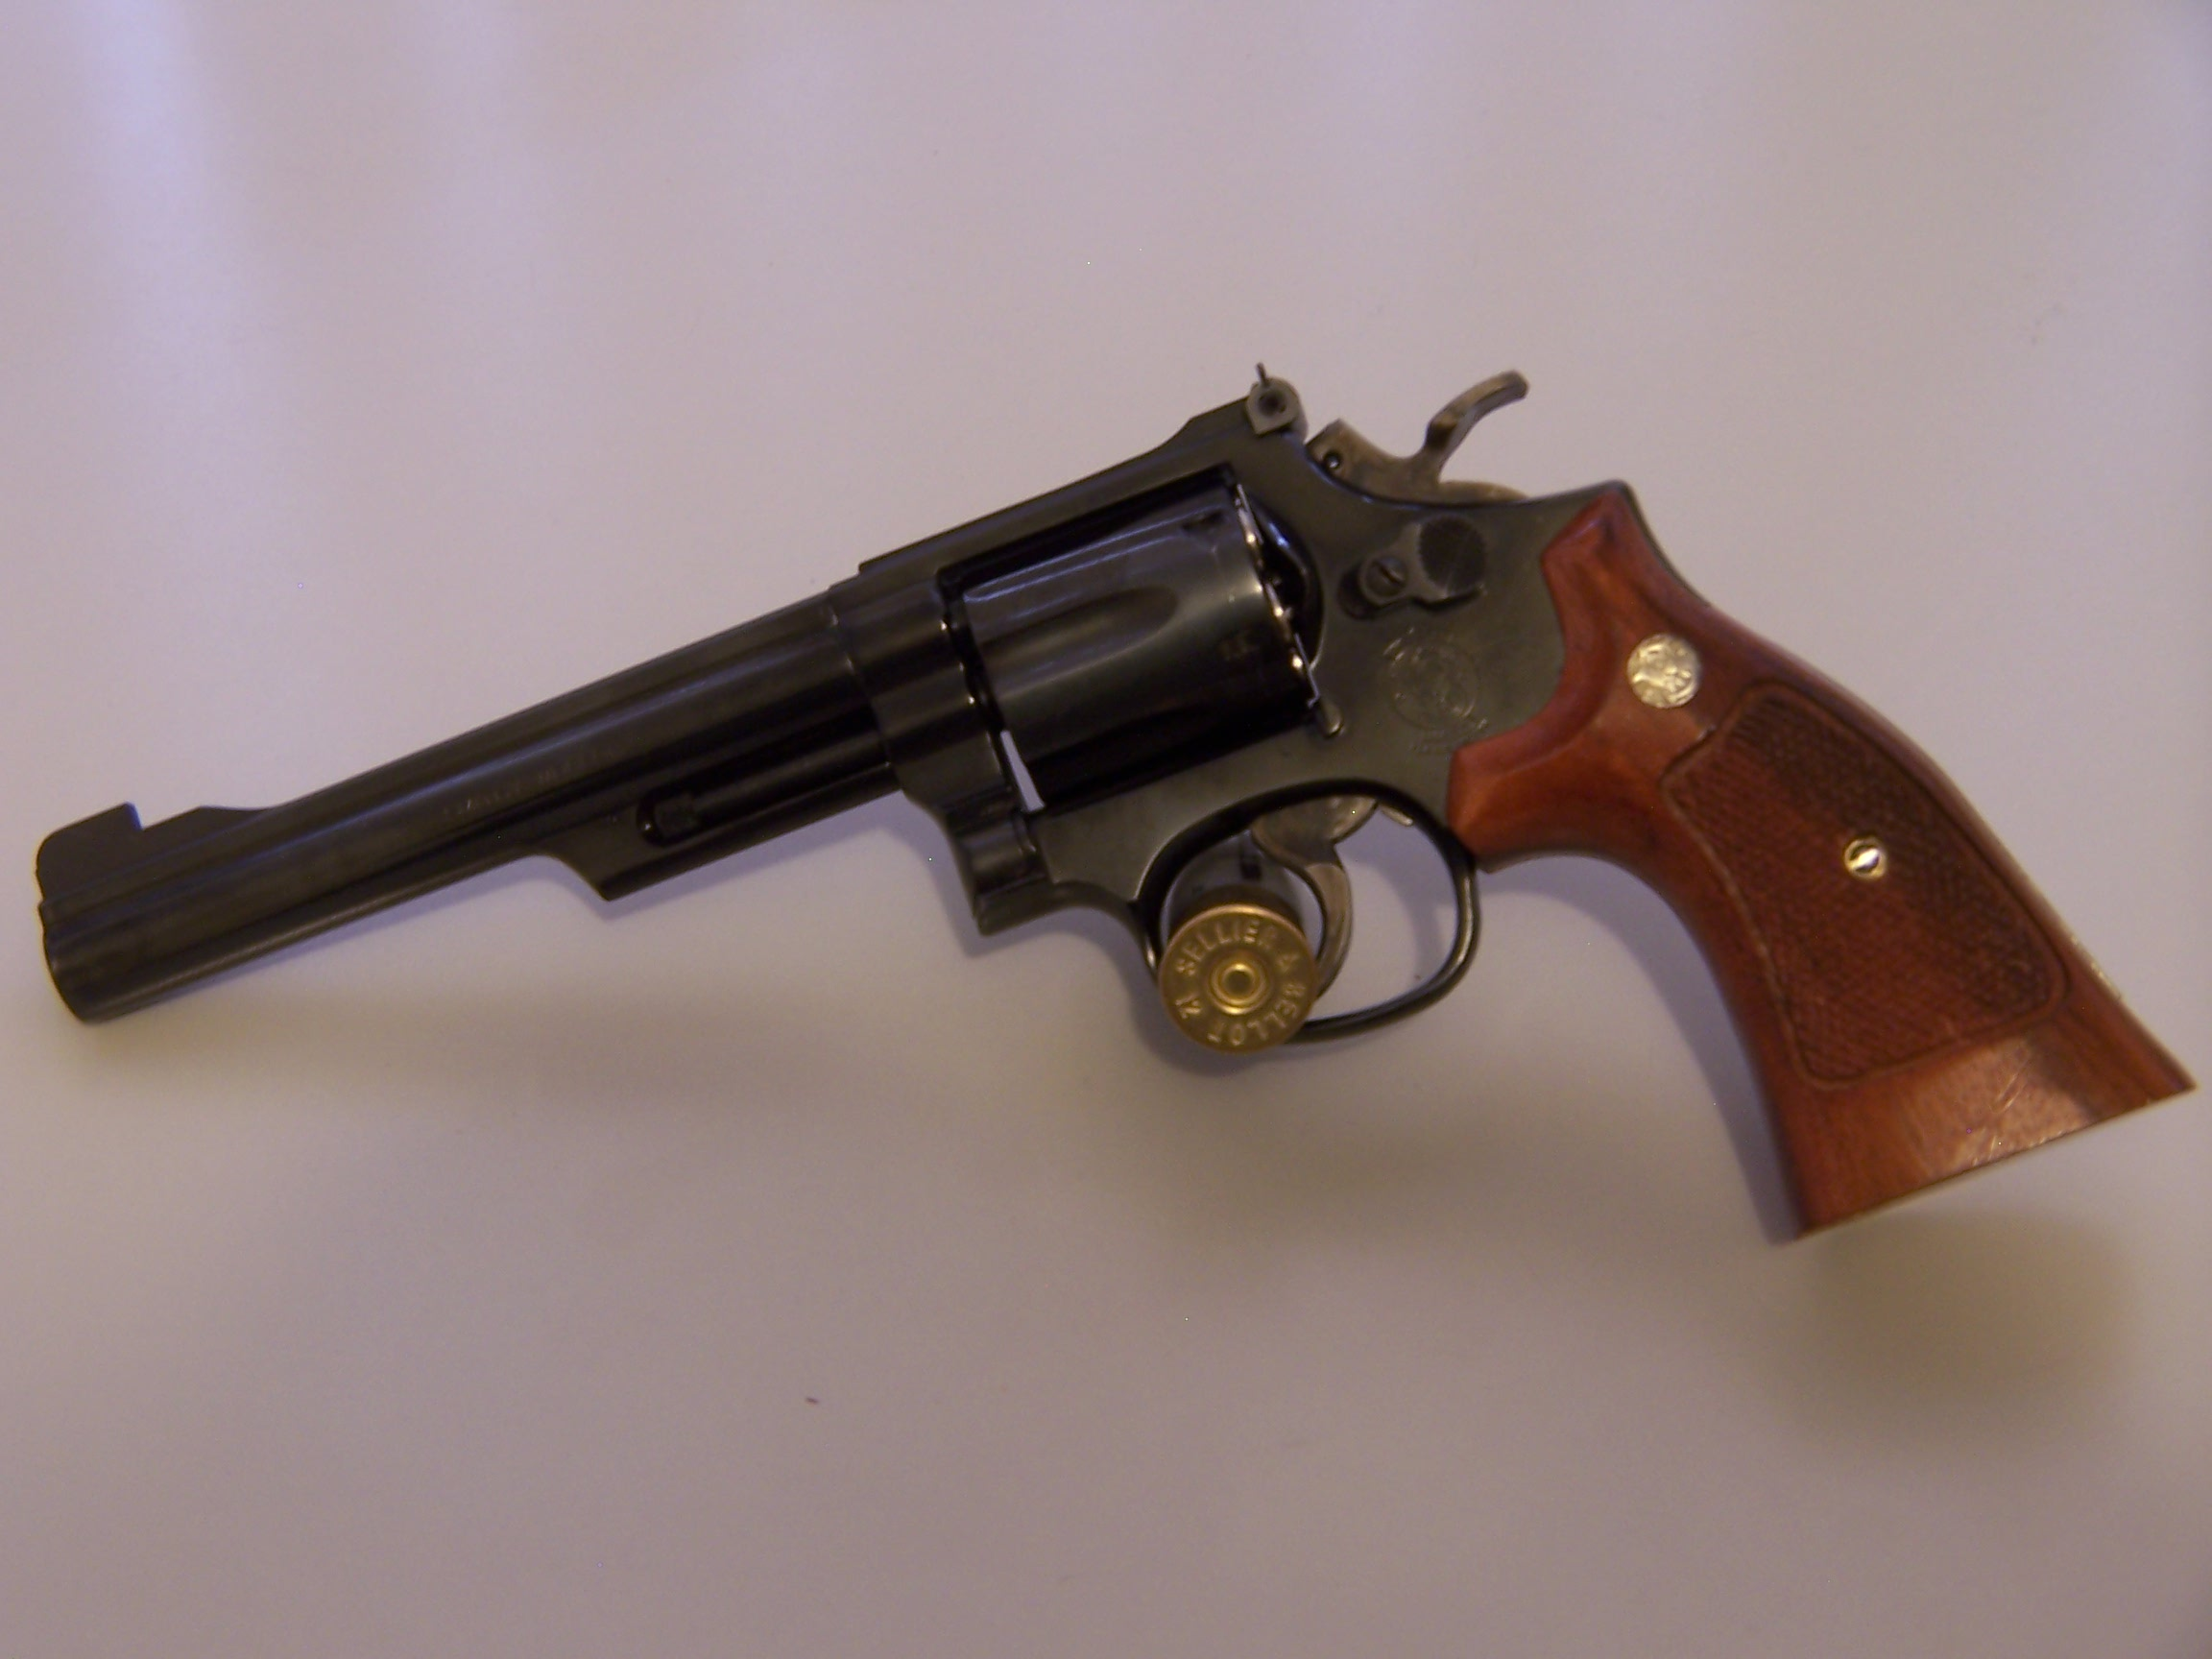 Smith & Wesson Model 19-100_0397.jpg